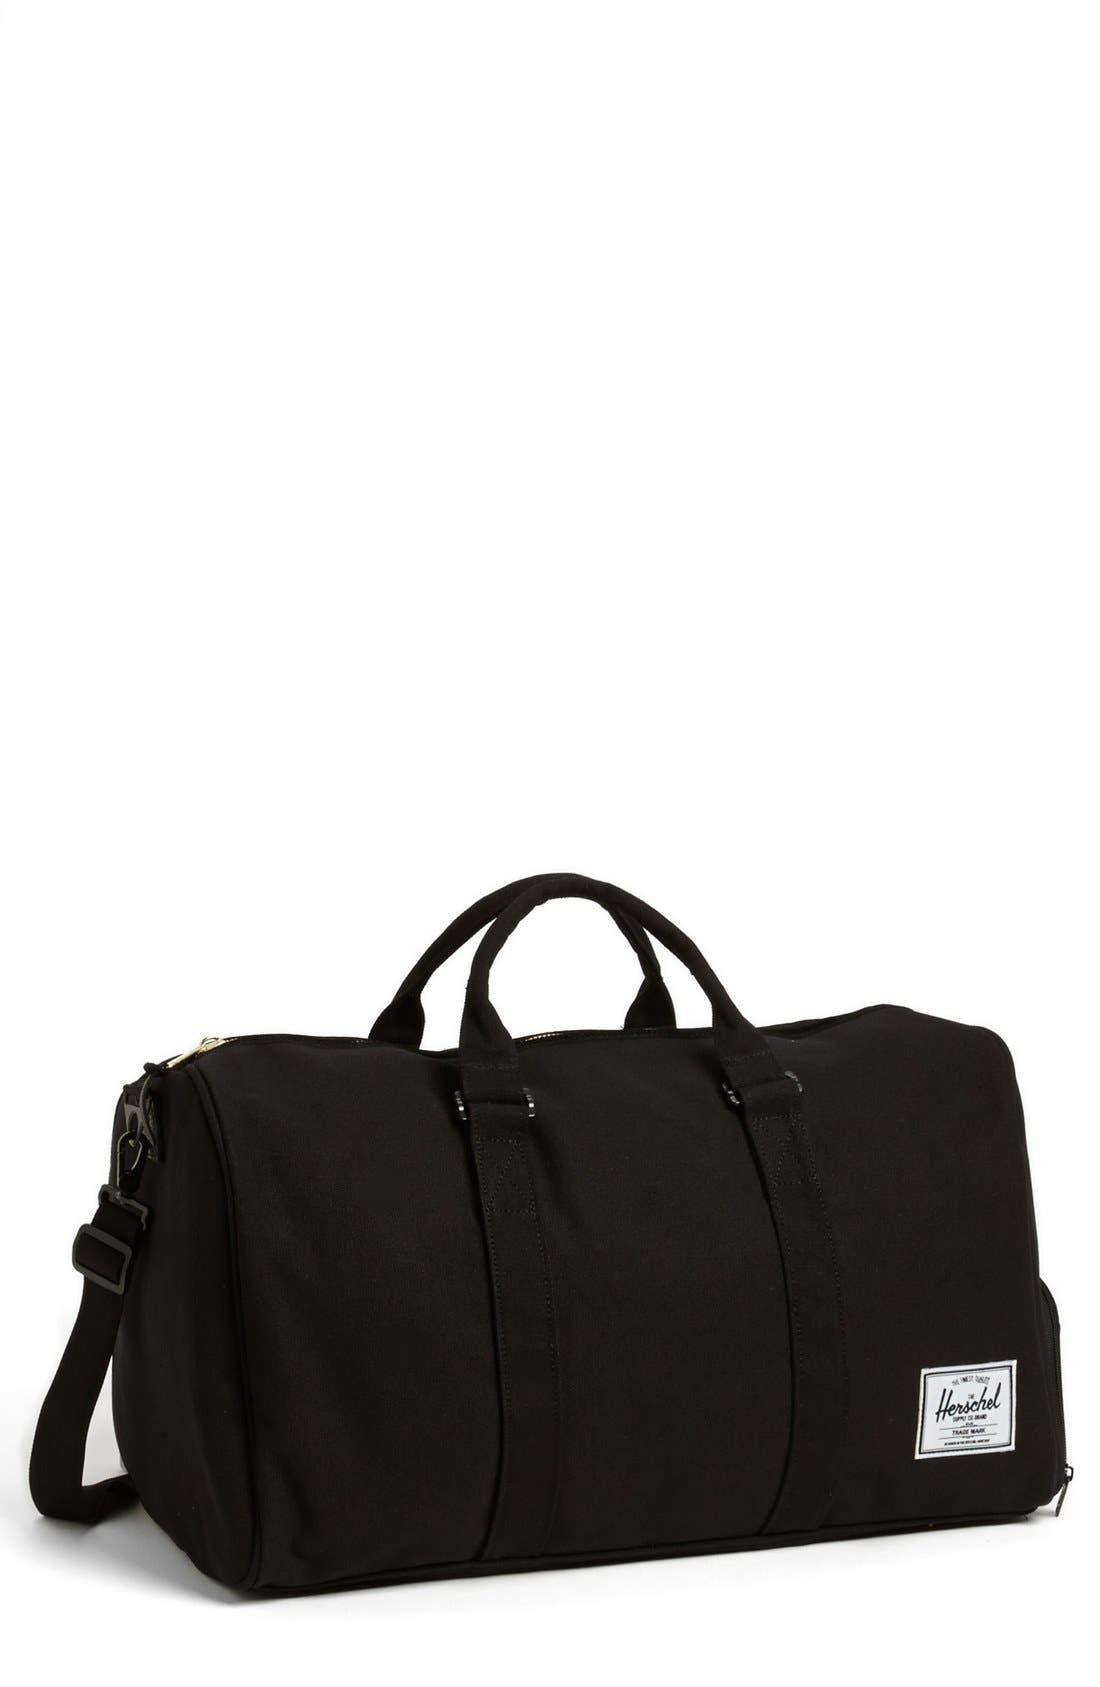 Alternate Image 1 Selected - Herschel Supply Co. 'Novel' Canvas Duffel Bag